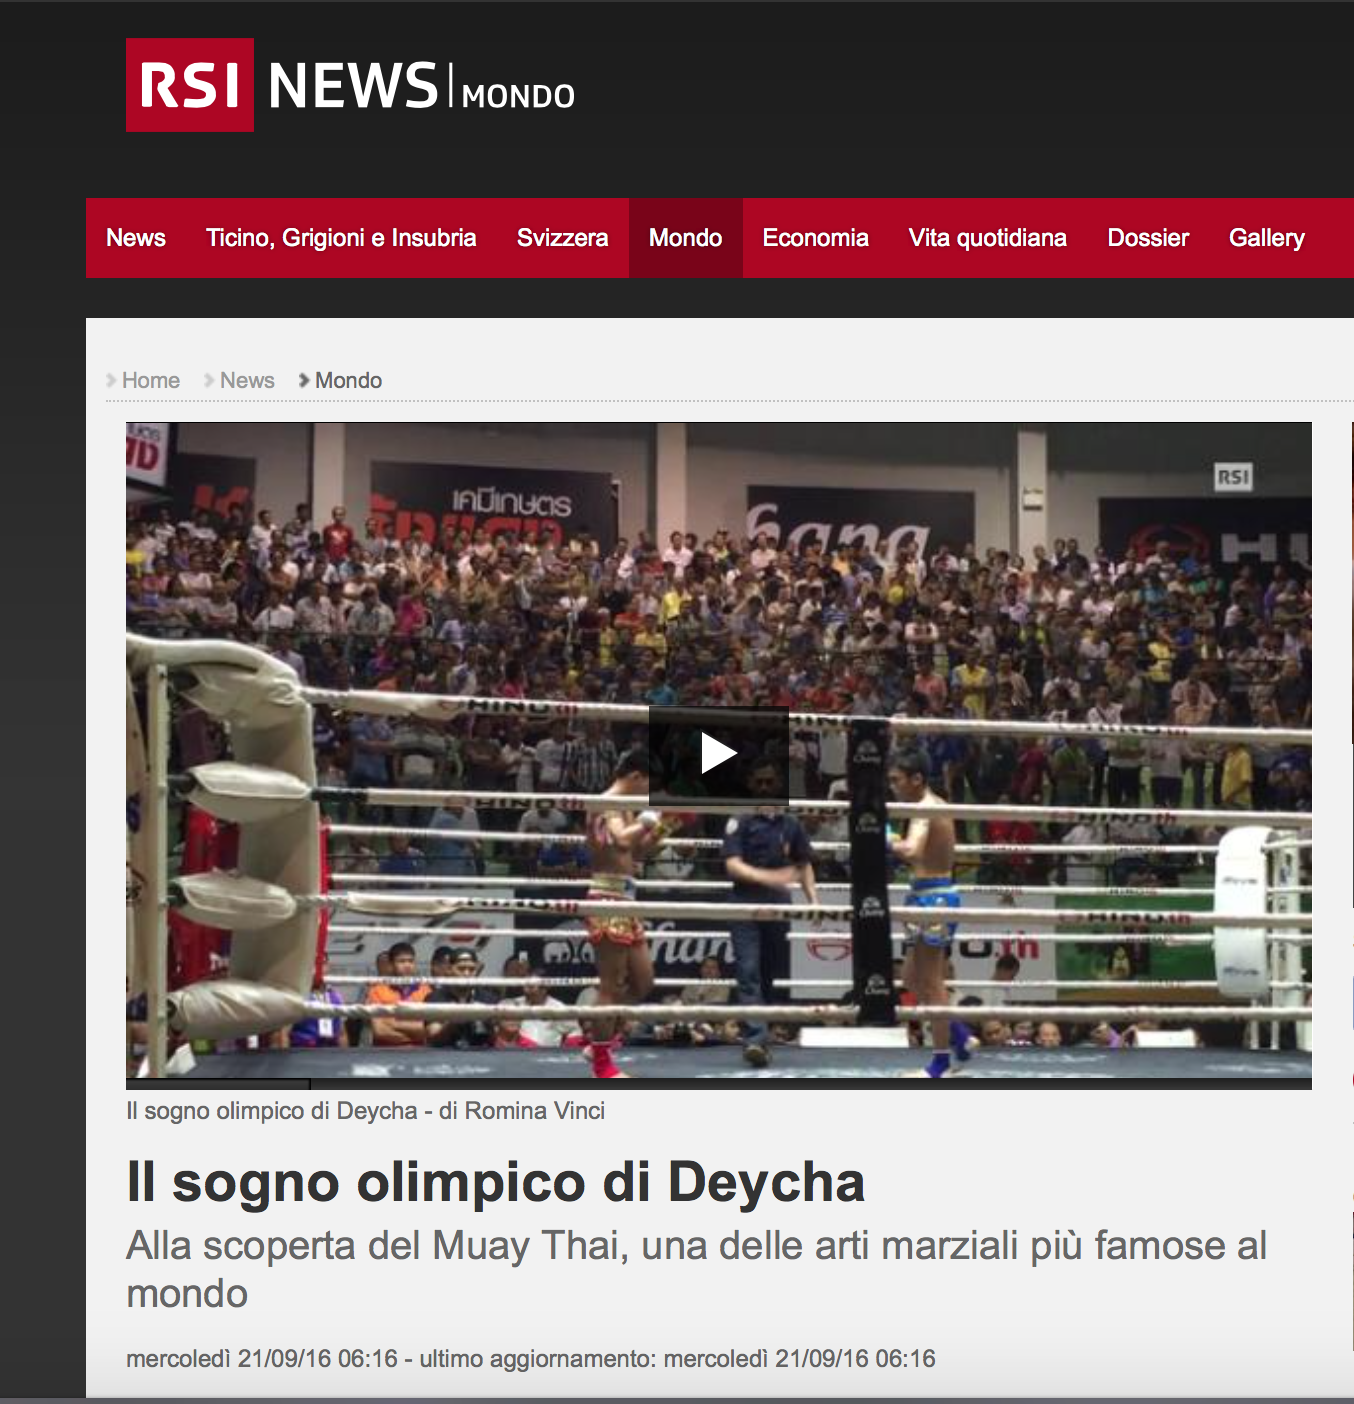 RSI - Radio Televisione Svizzera - September 2016